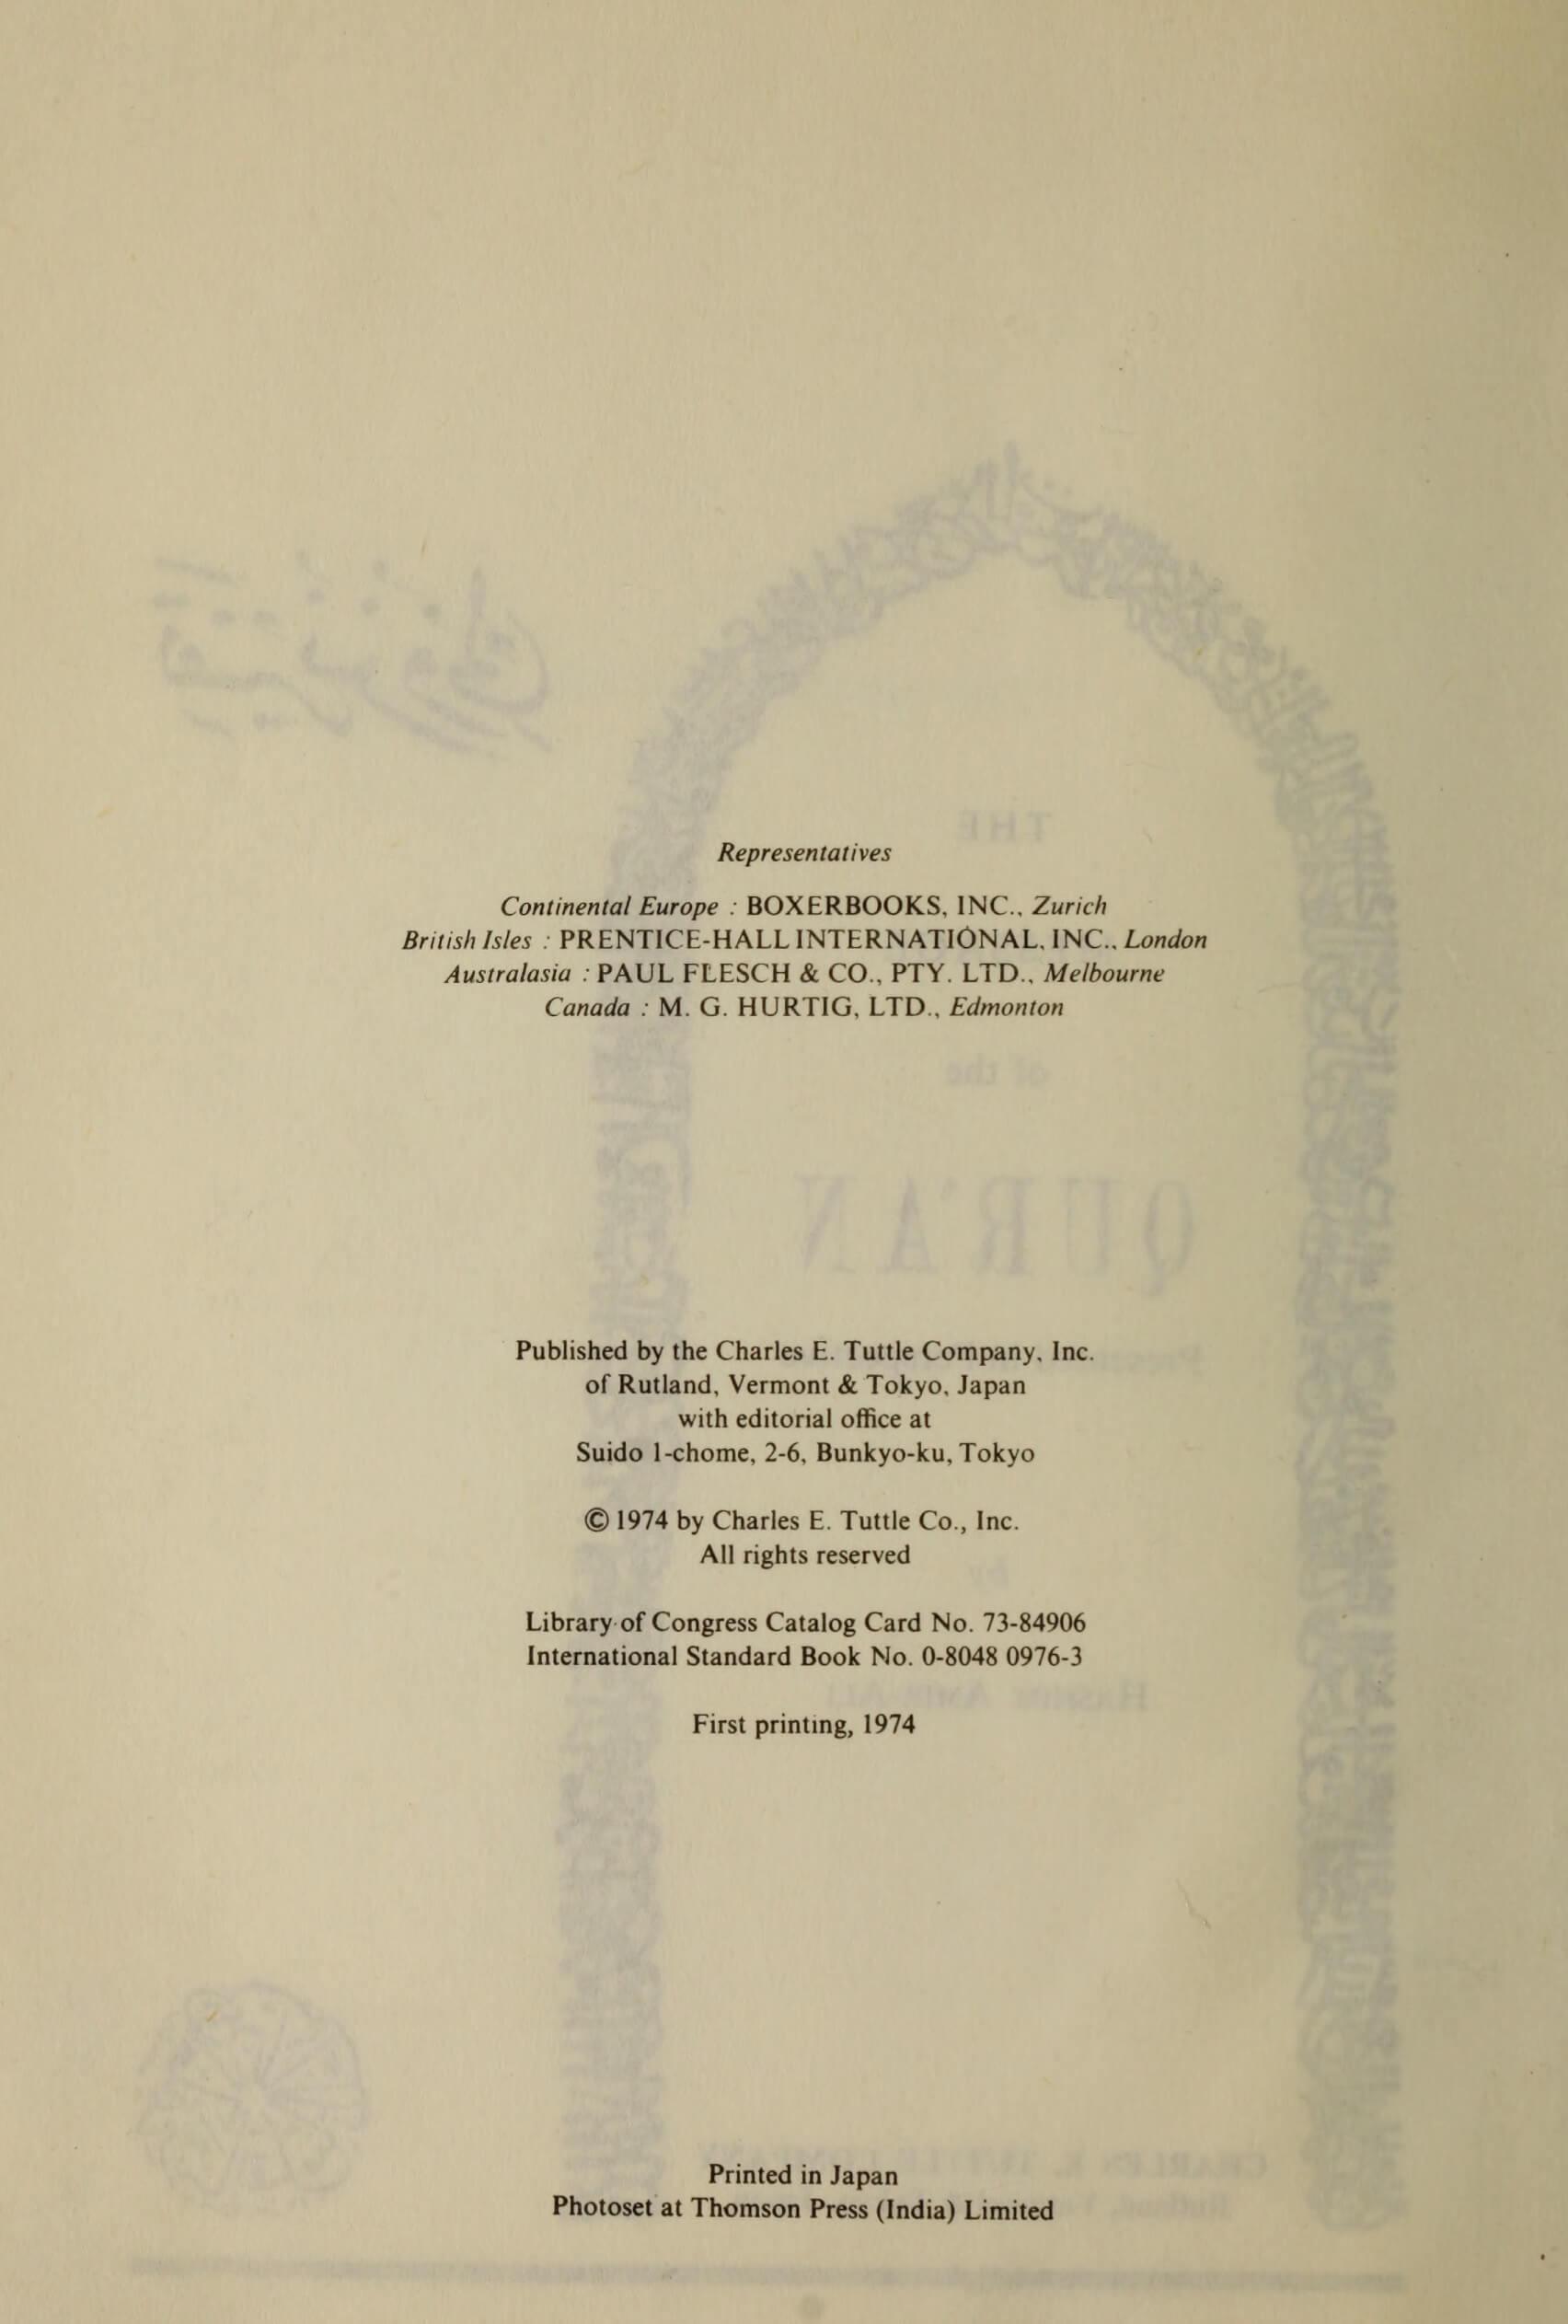 Hashim Amir-Ali 1974 Quran Explorer, Page 3